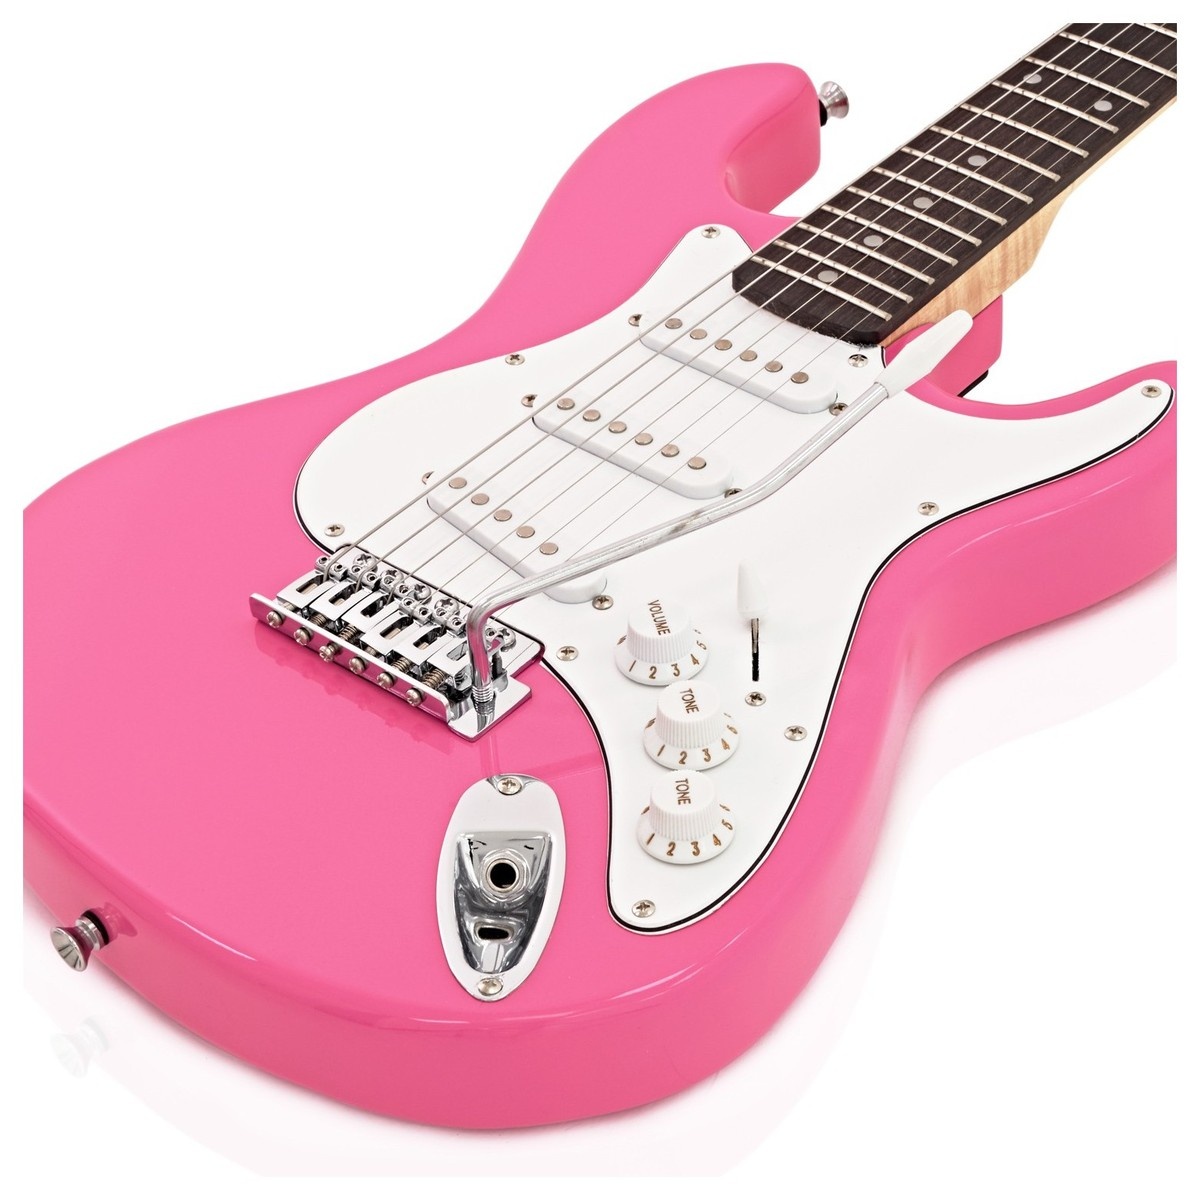 3/4 LA E-Gitarre von Gear4music, rosa - Box geöffnet bei Gear4music